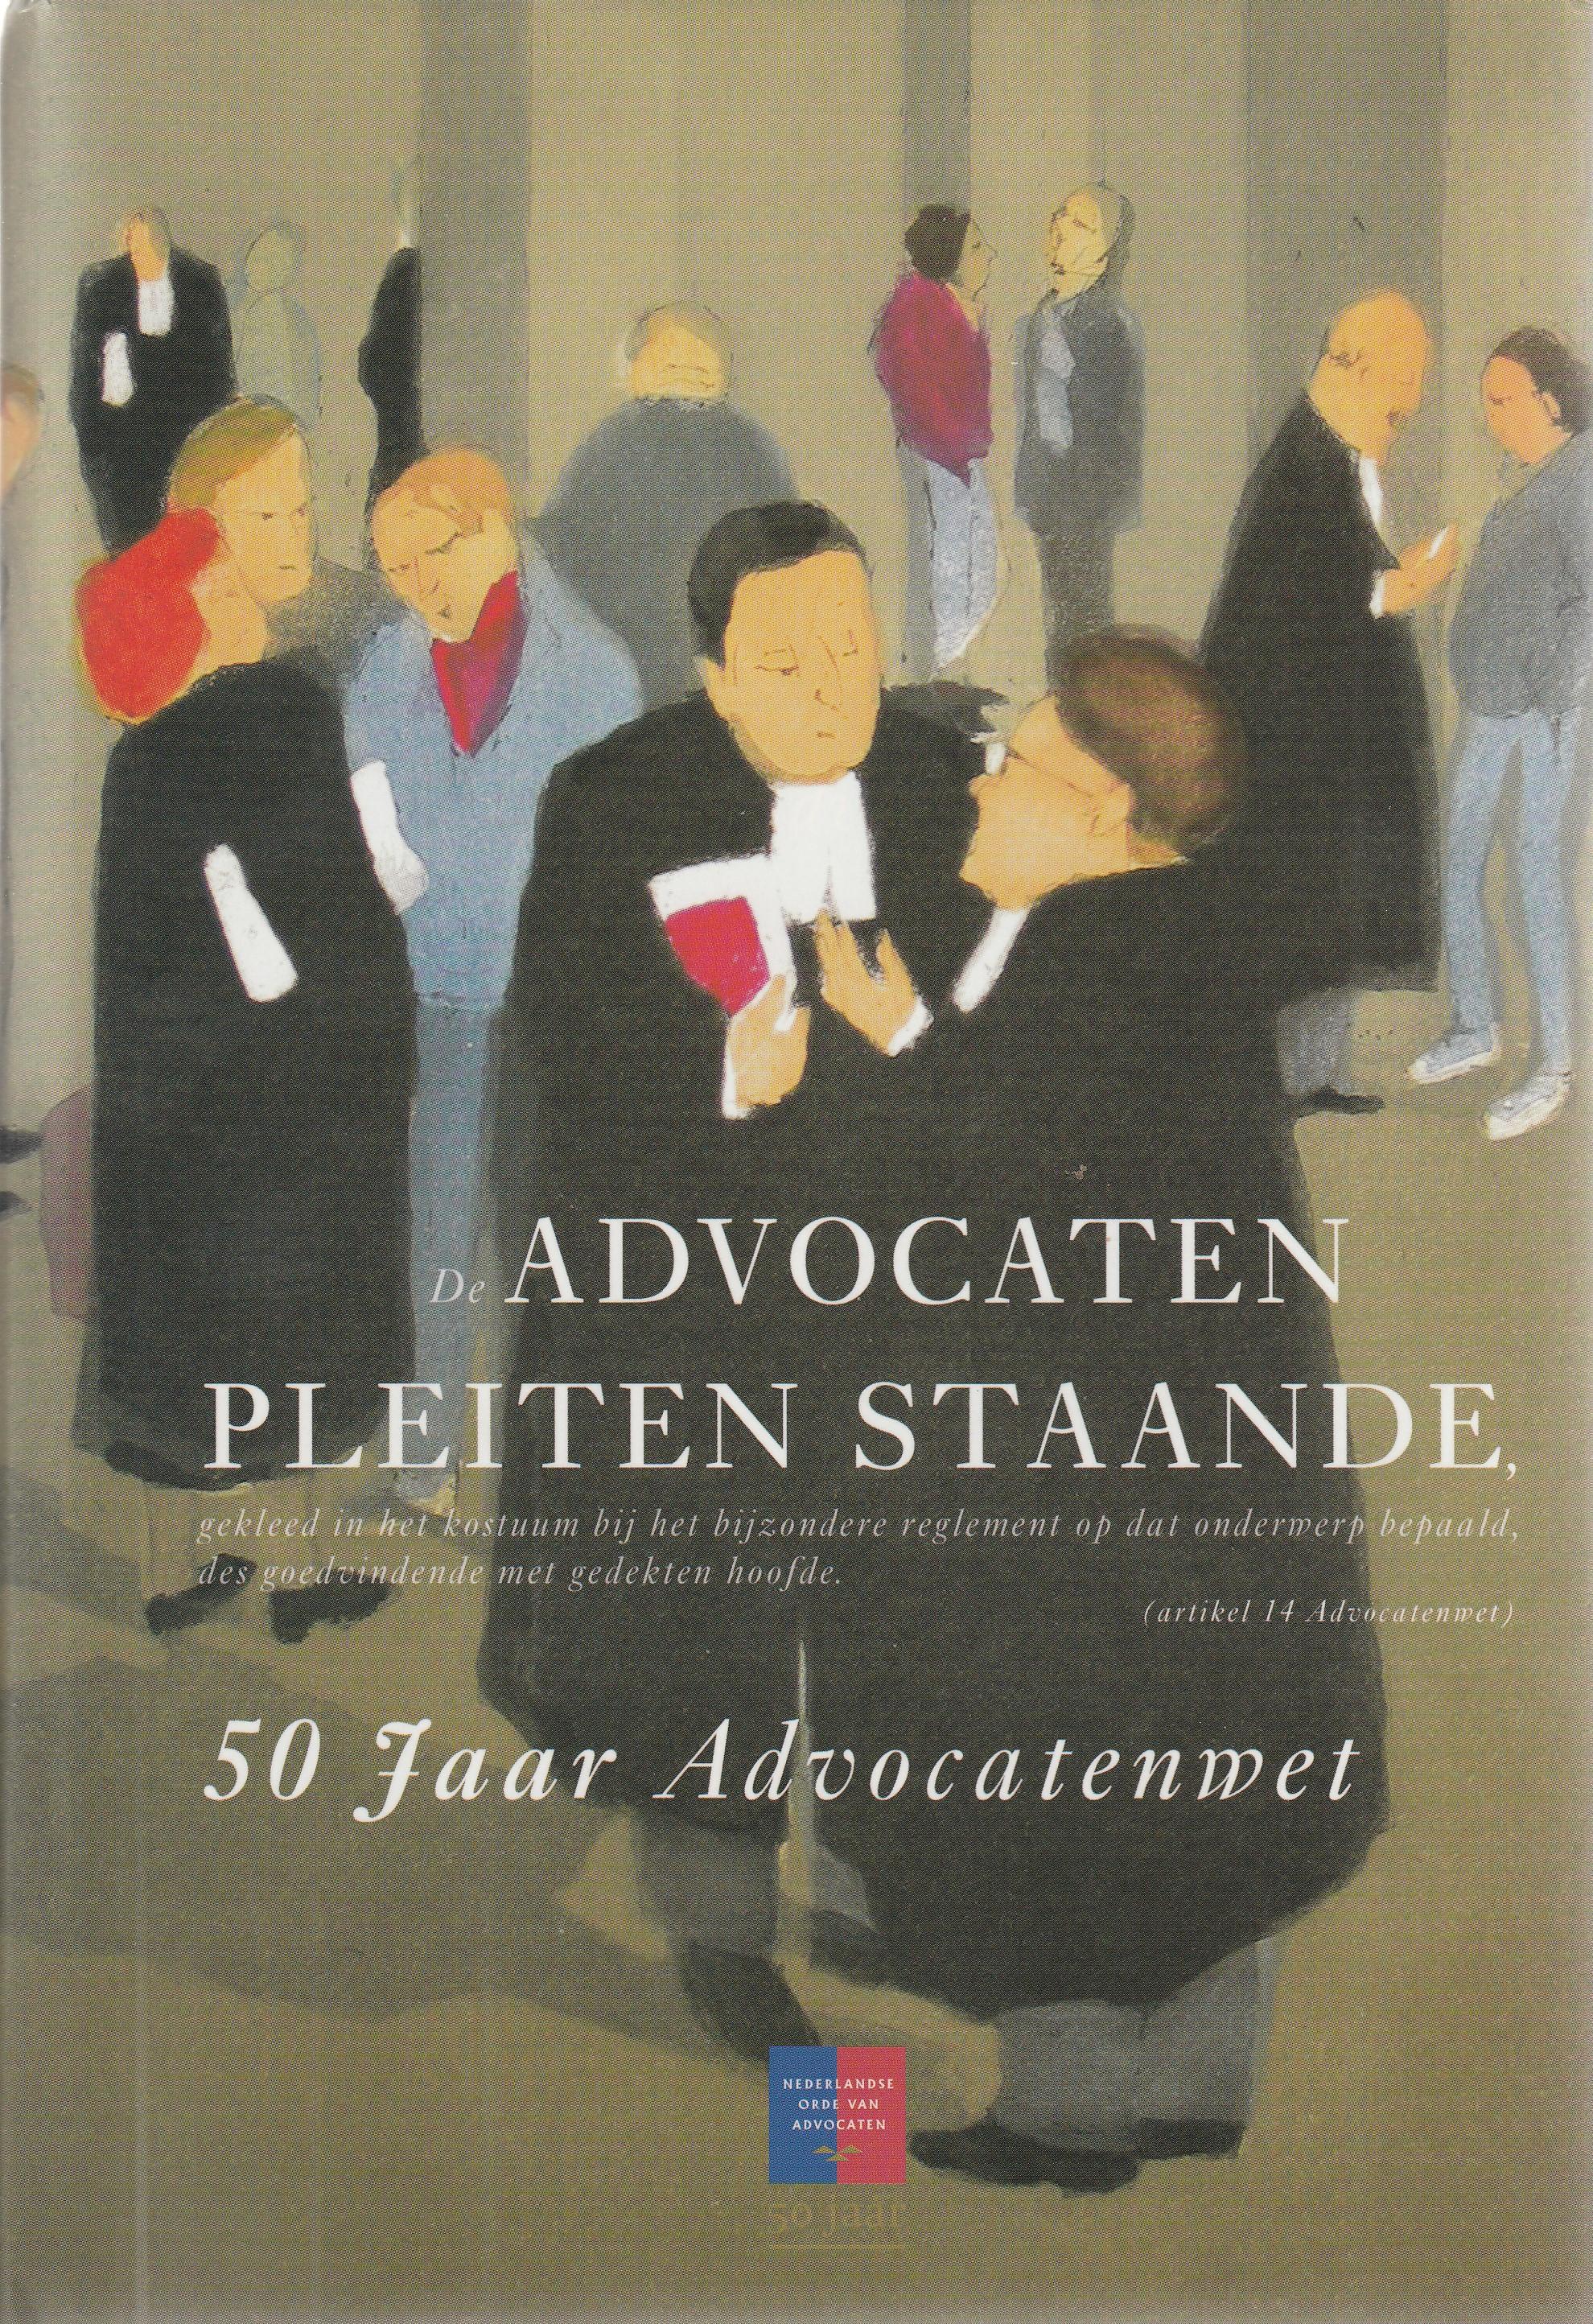 Advocaten pleiten staande